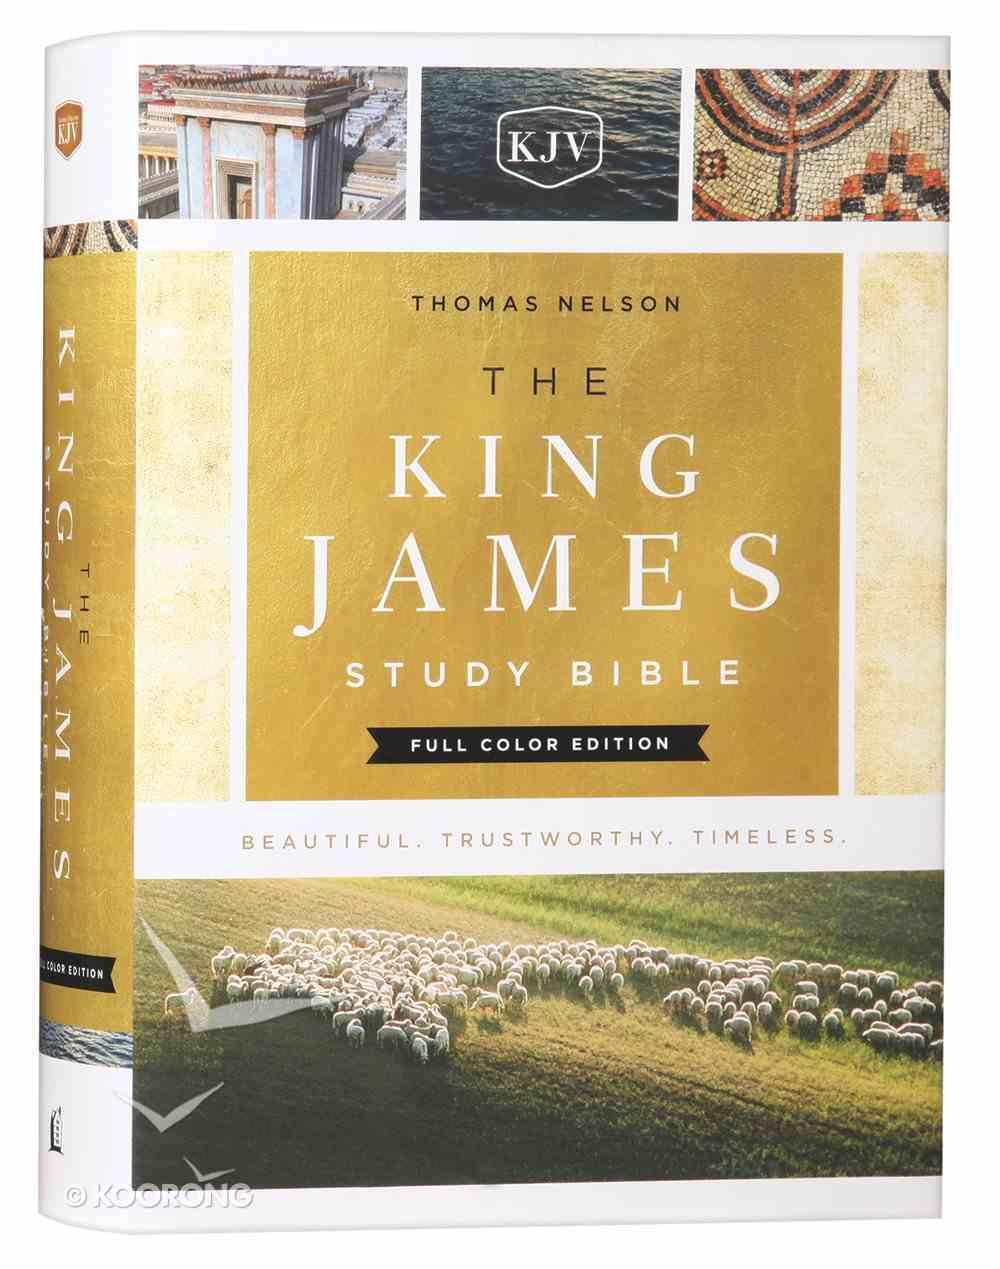 KJV Study Bible Full-Color Edition (Red Letter Edition) Hardback